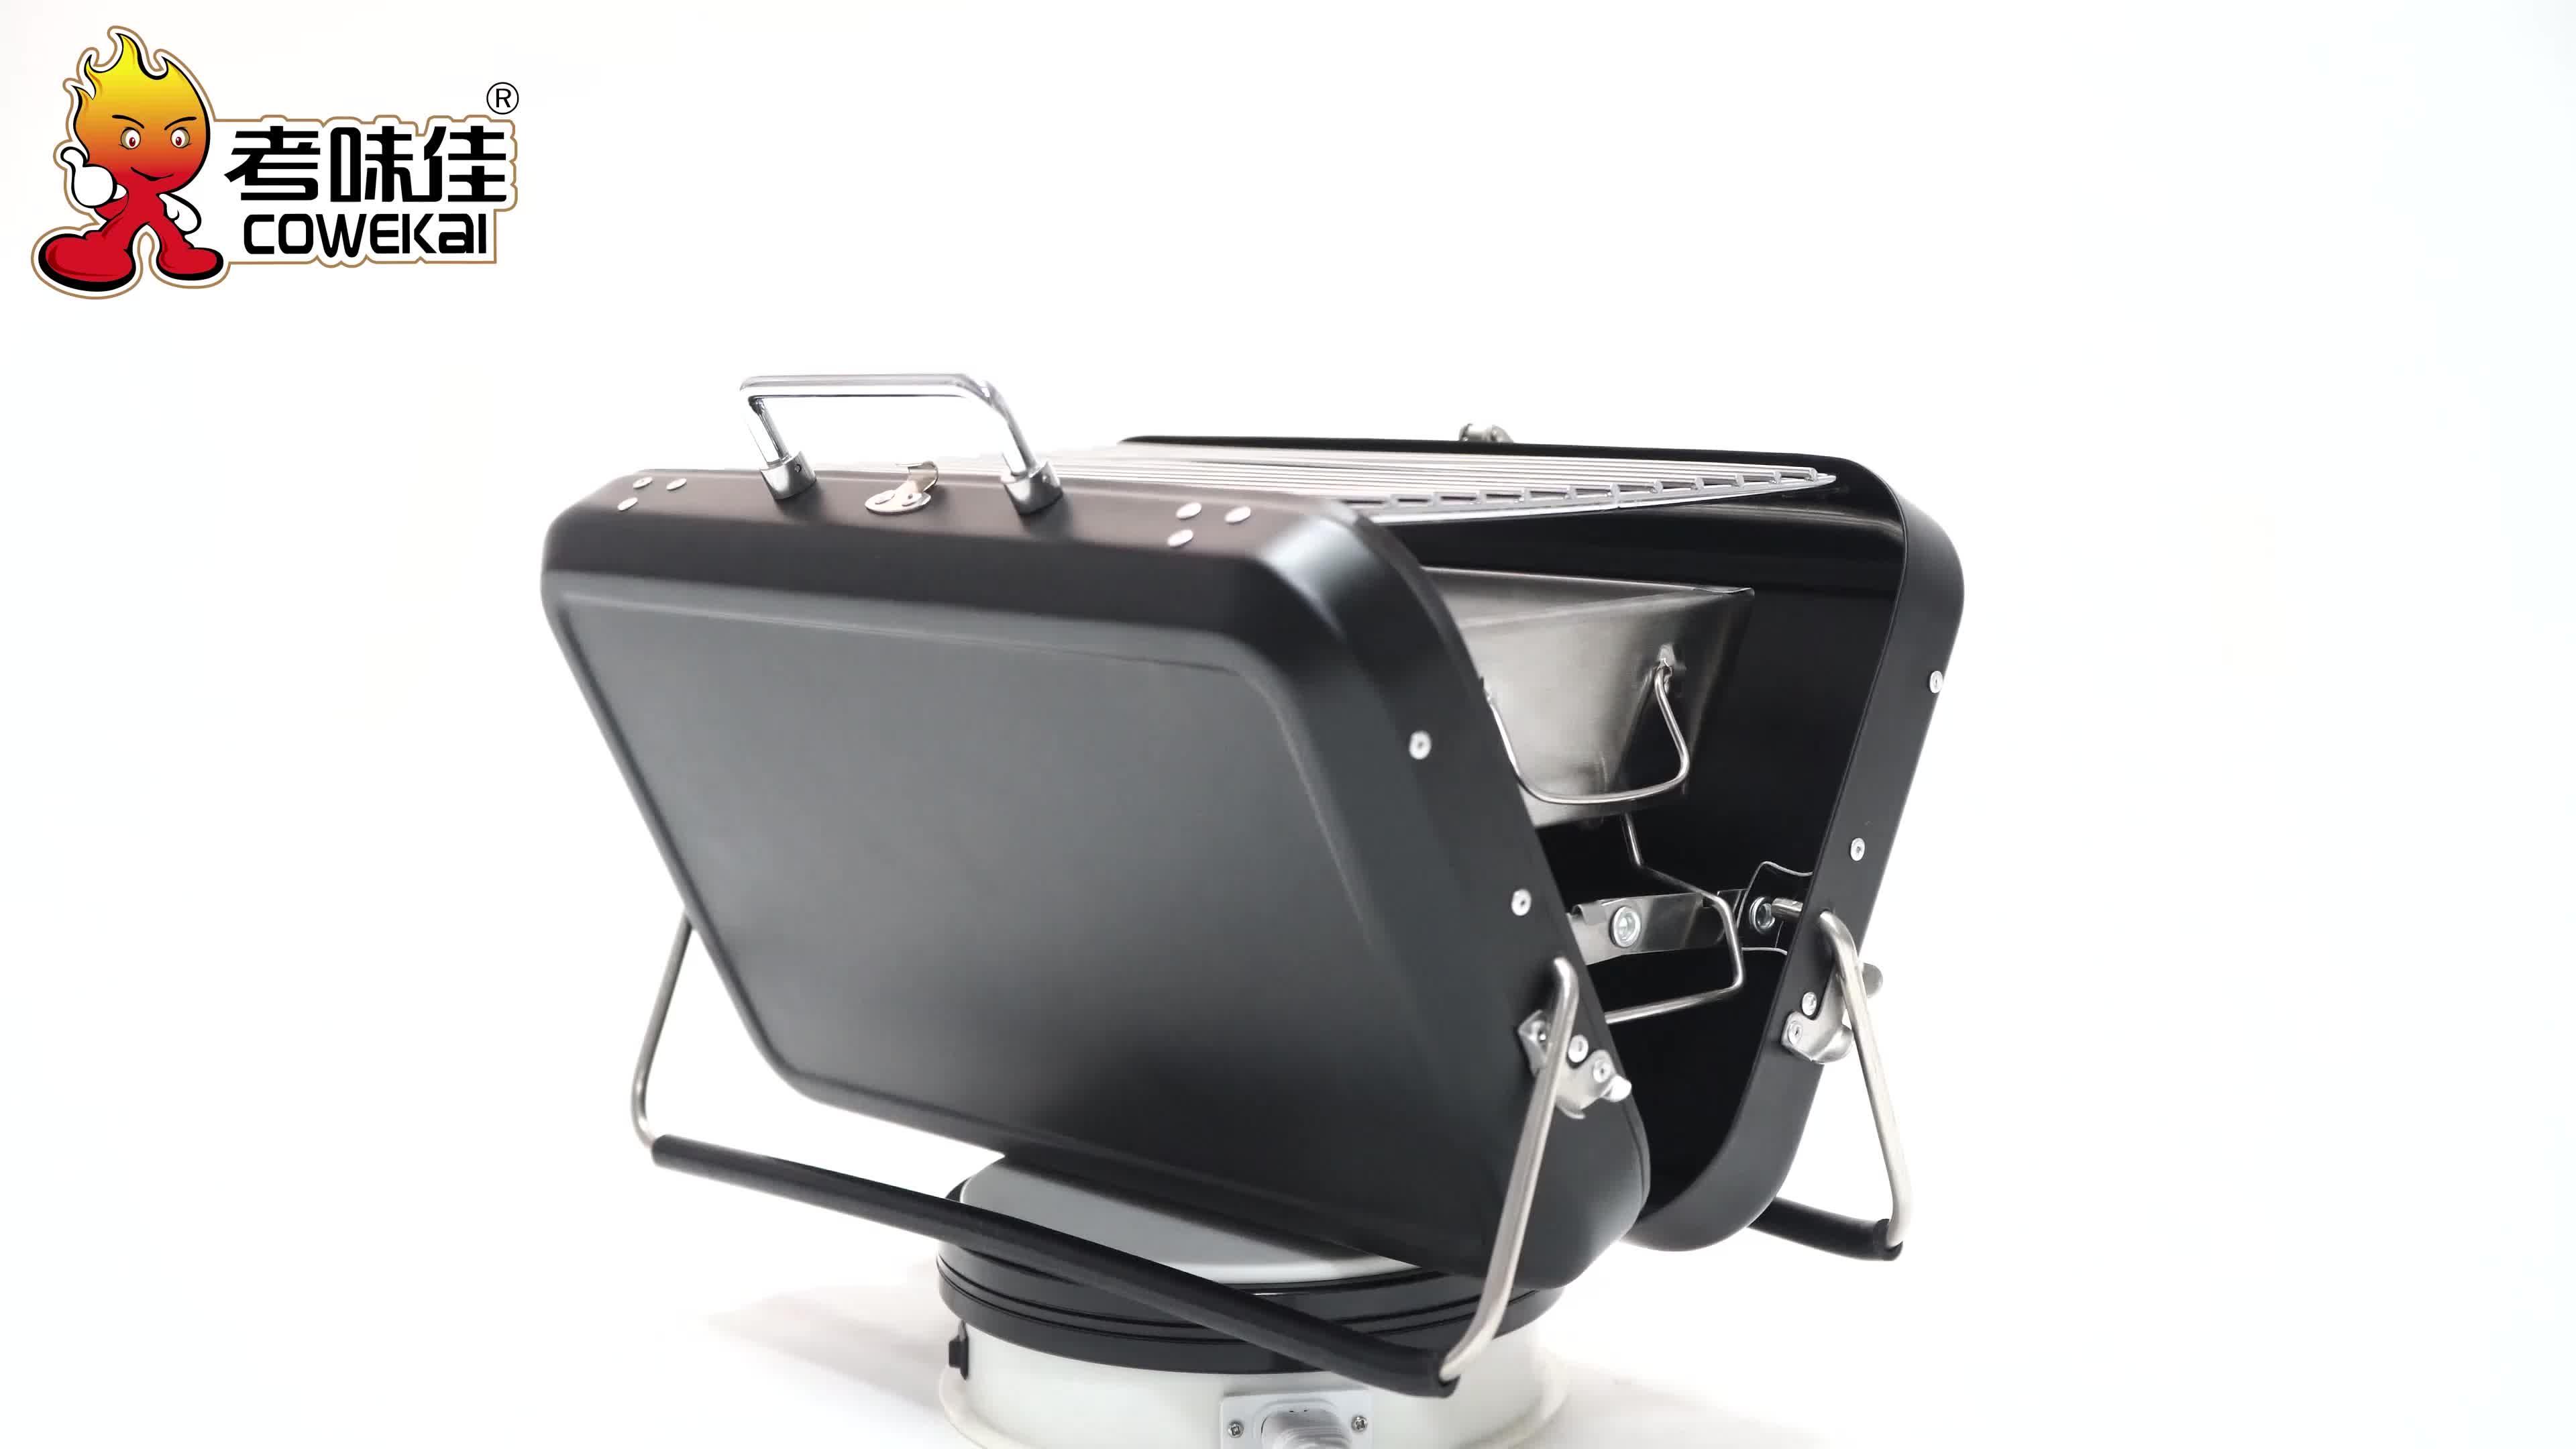 Koffer Ontwerp Outdoor Metalen Rvs Koreaanse Japanse Camping Draagbare Barbecue Grills Houtskool BBQ Grill